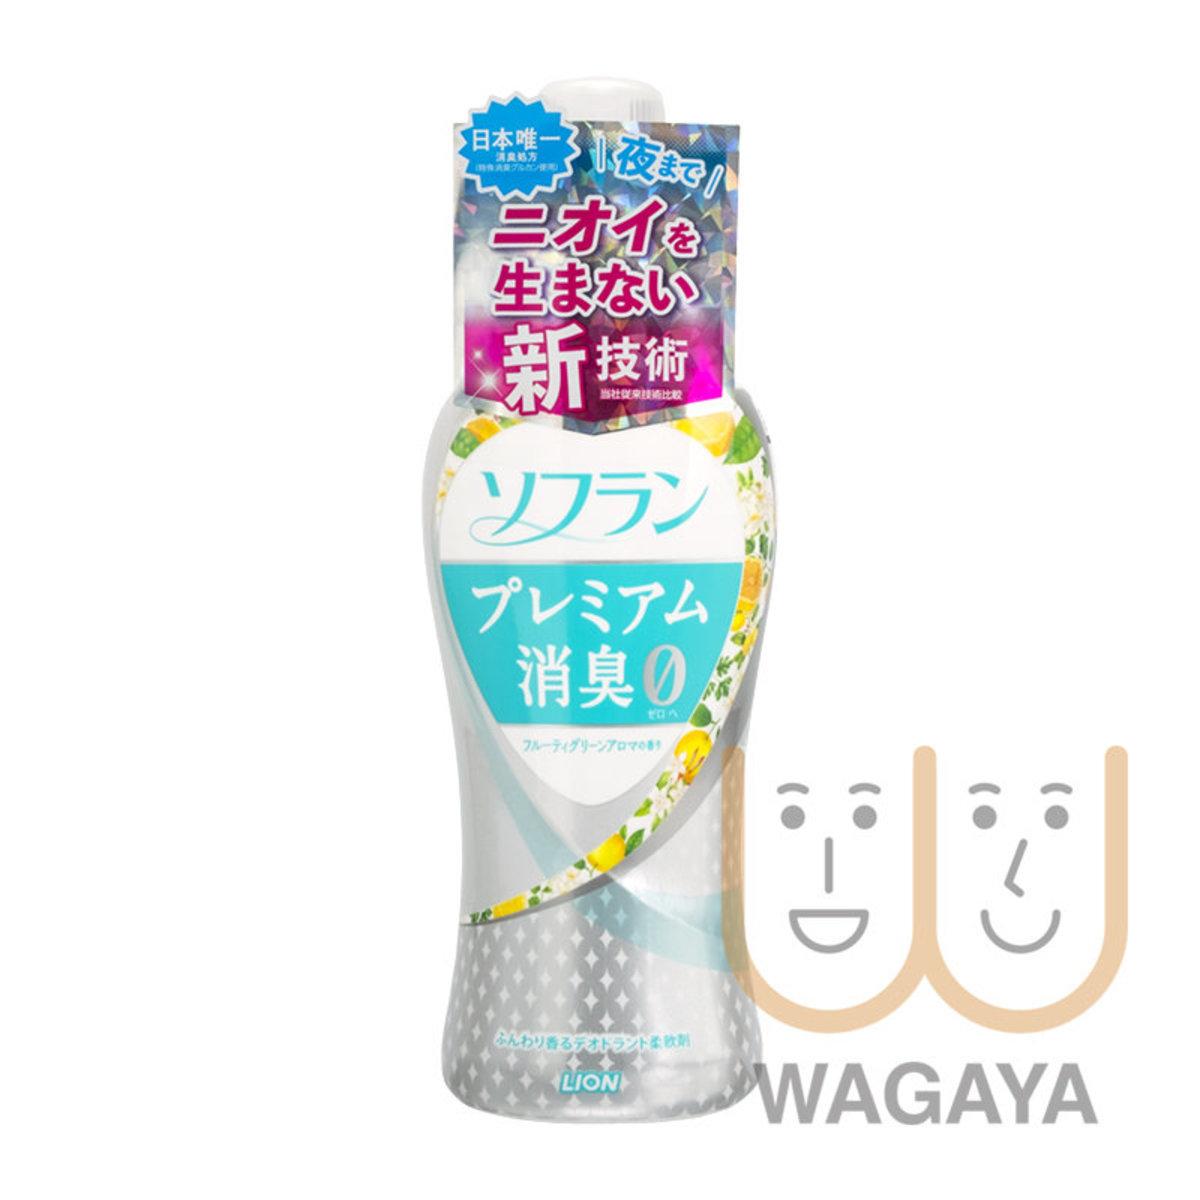 Soflan Premium Aroma Deodorant Softener 550ml (Fruity Aroma-Green)  (Parallel Import)